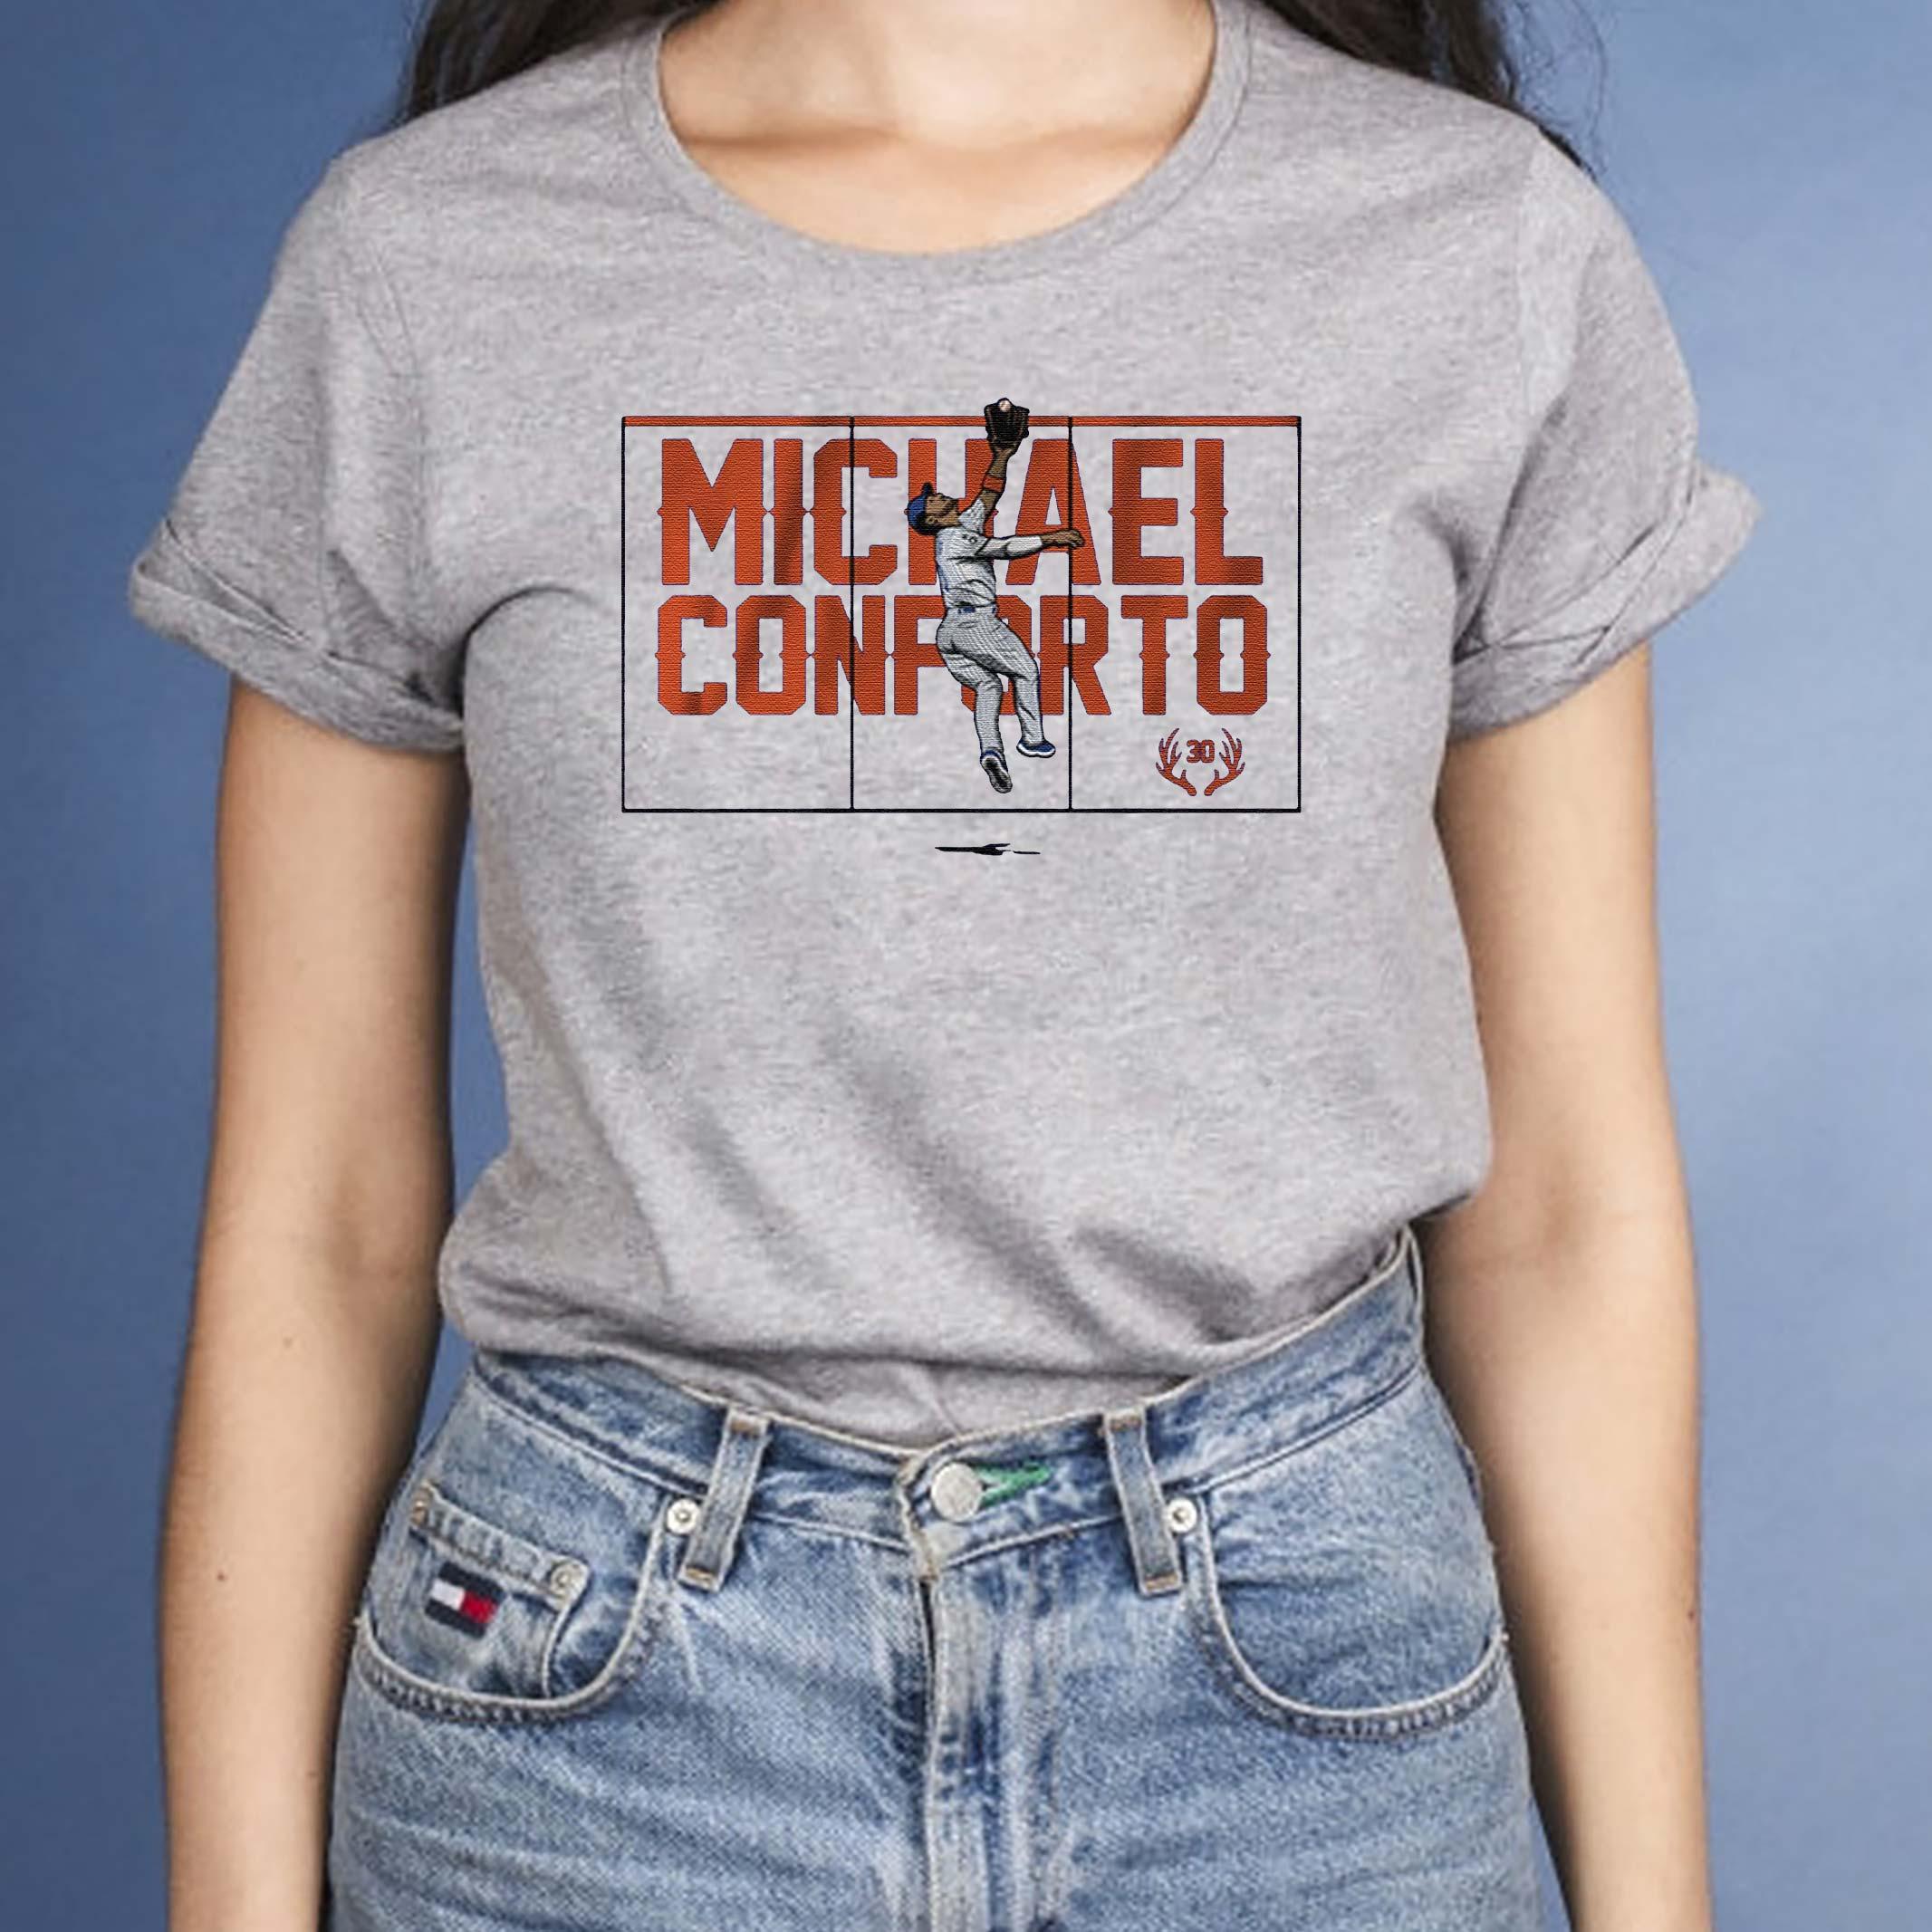 Michael-Conforto-T-Shirt